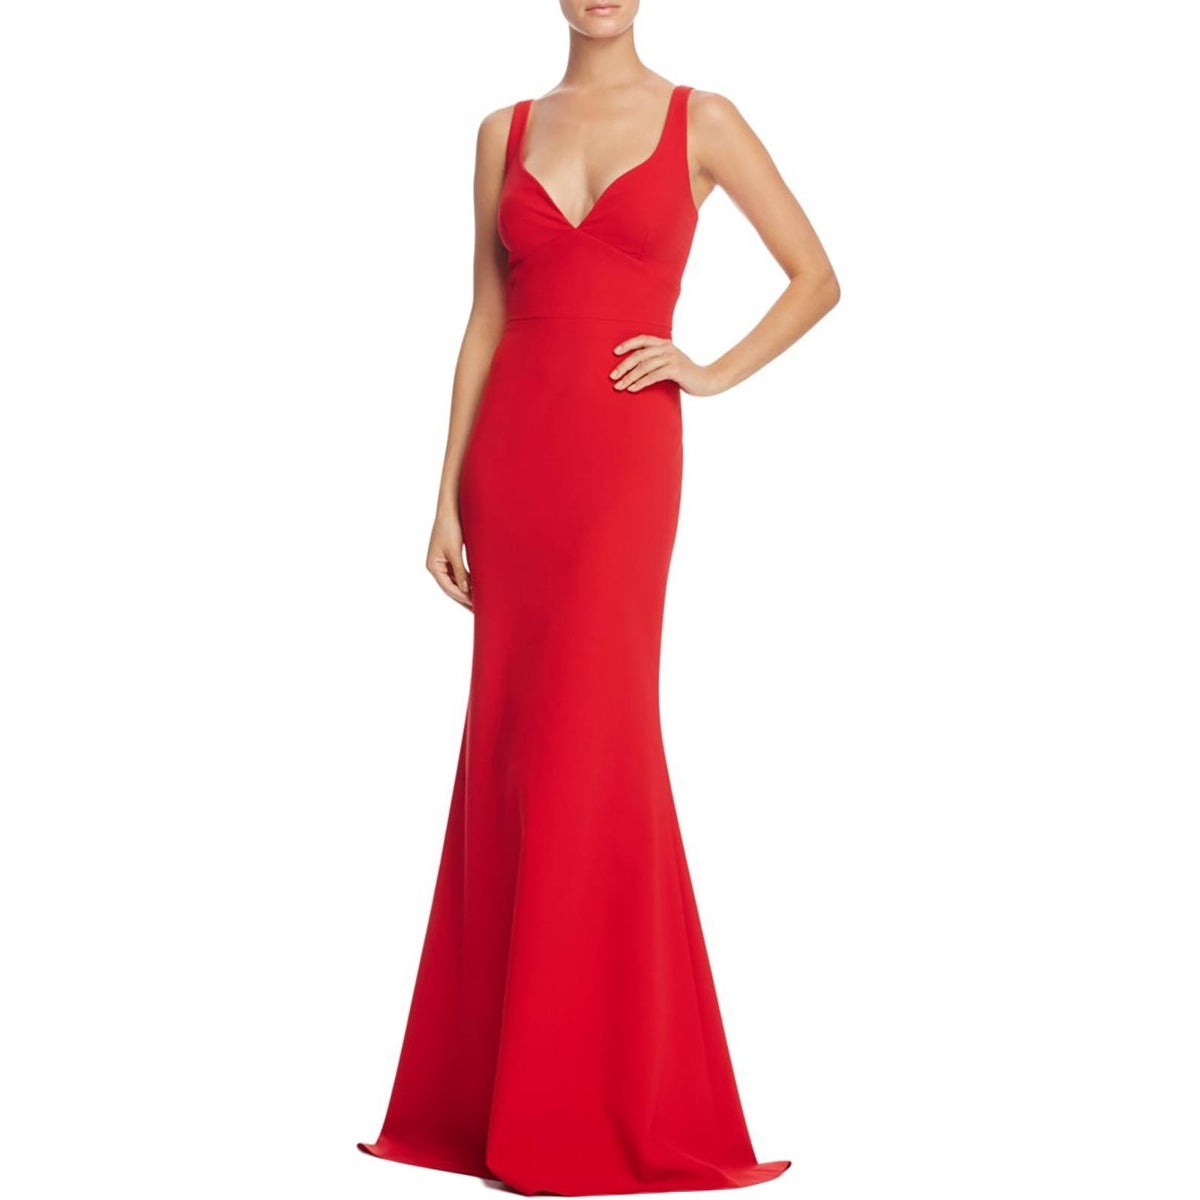 3ac8eb66 JILL Jill Stuart Dresses | Find Great Women's Clothing Deals Shopping at  Overstock